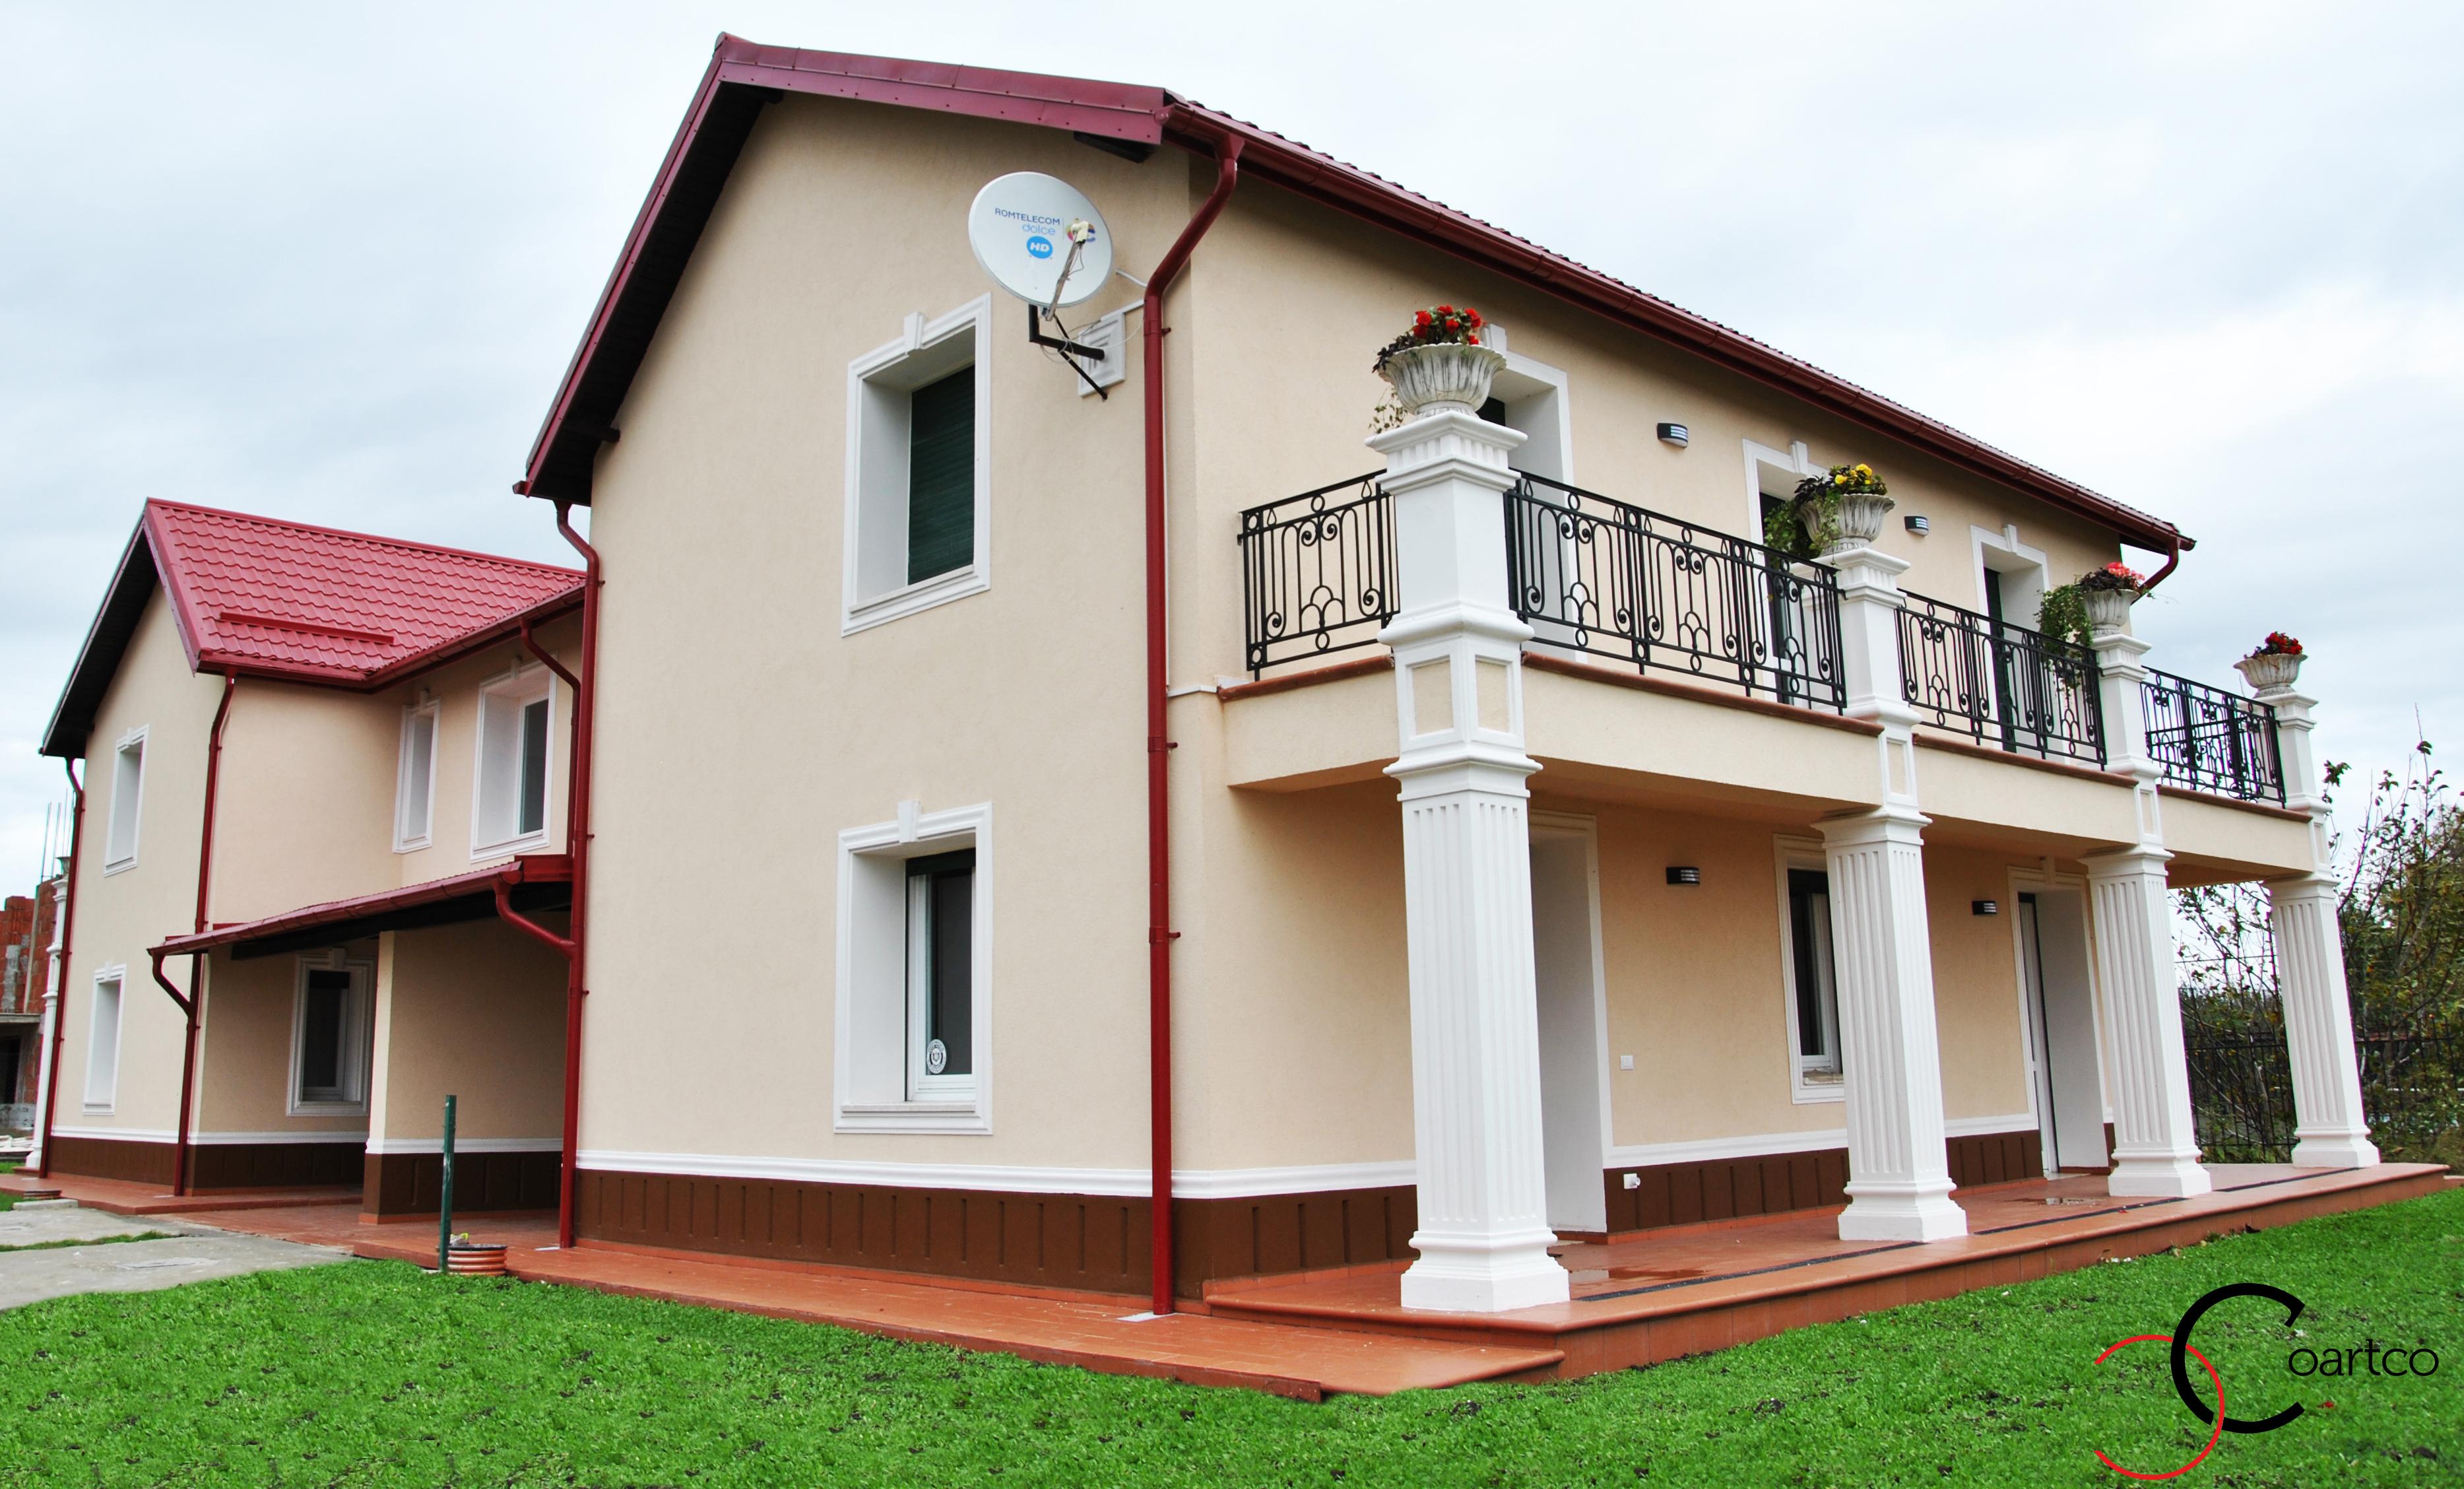 lucrari proiecte profile decorative polistiren exterior coartco casa art 10 4 coartco poza 215